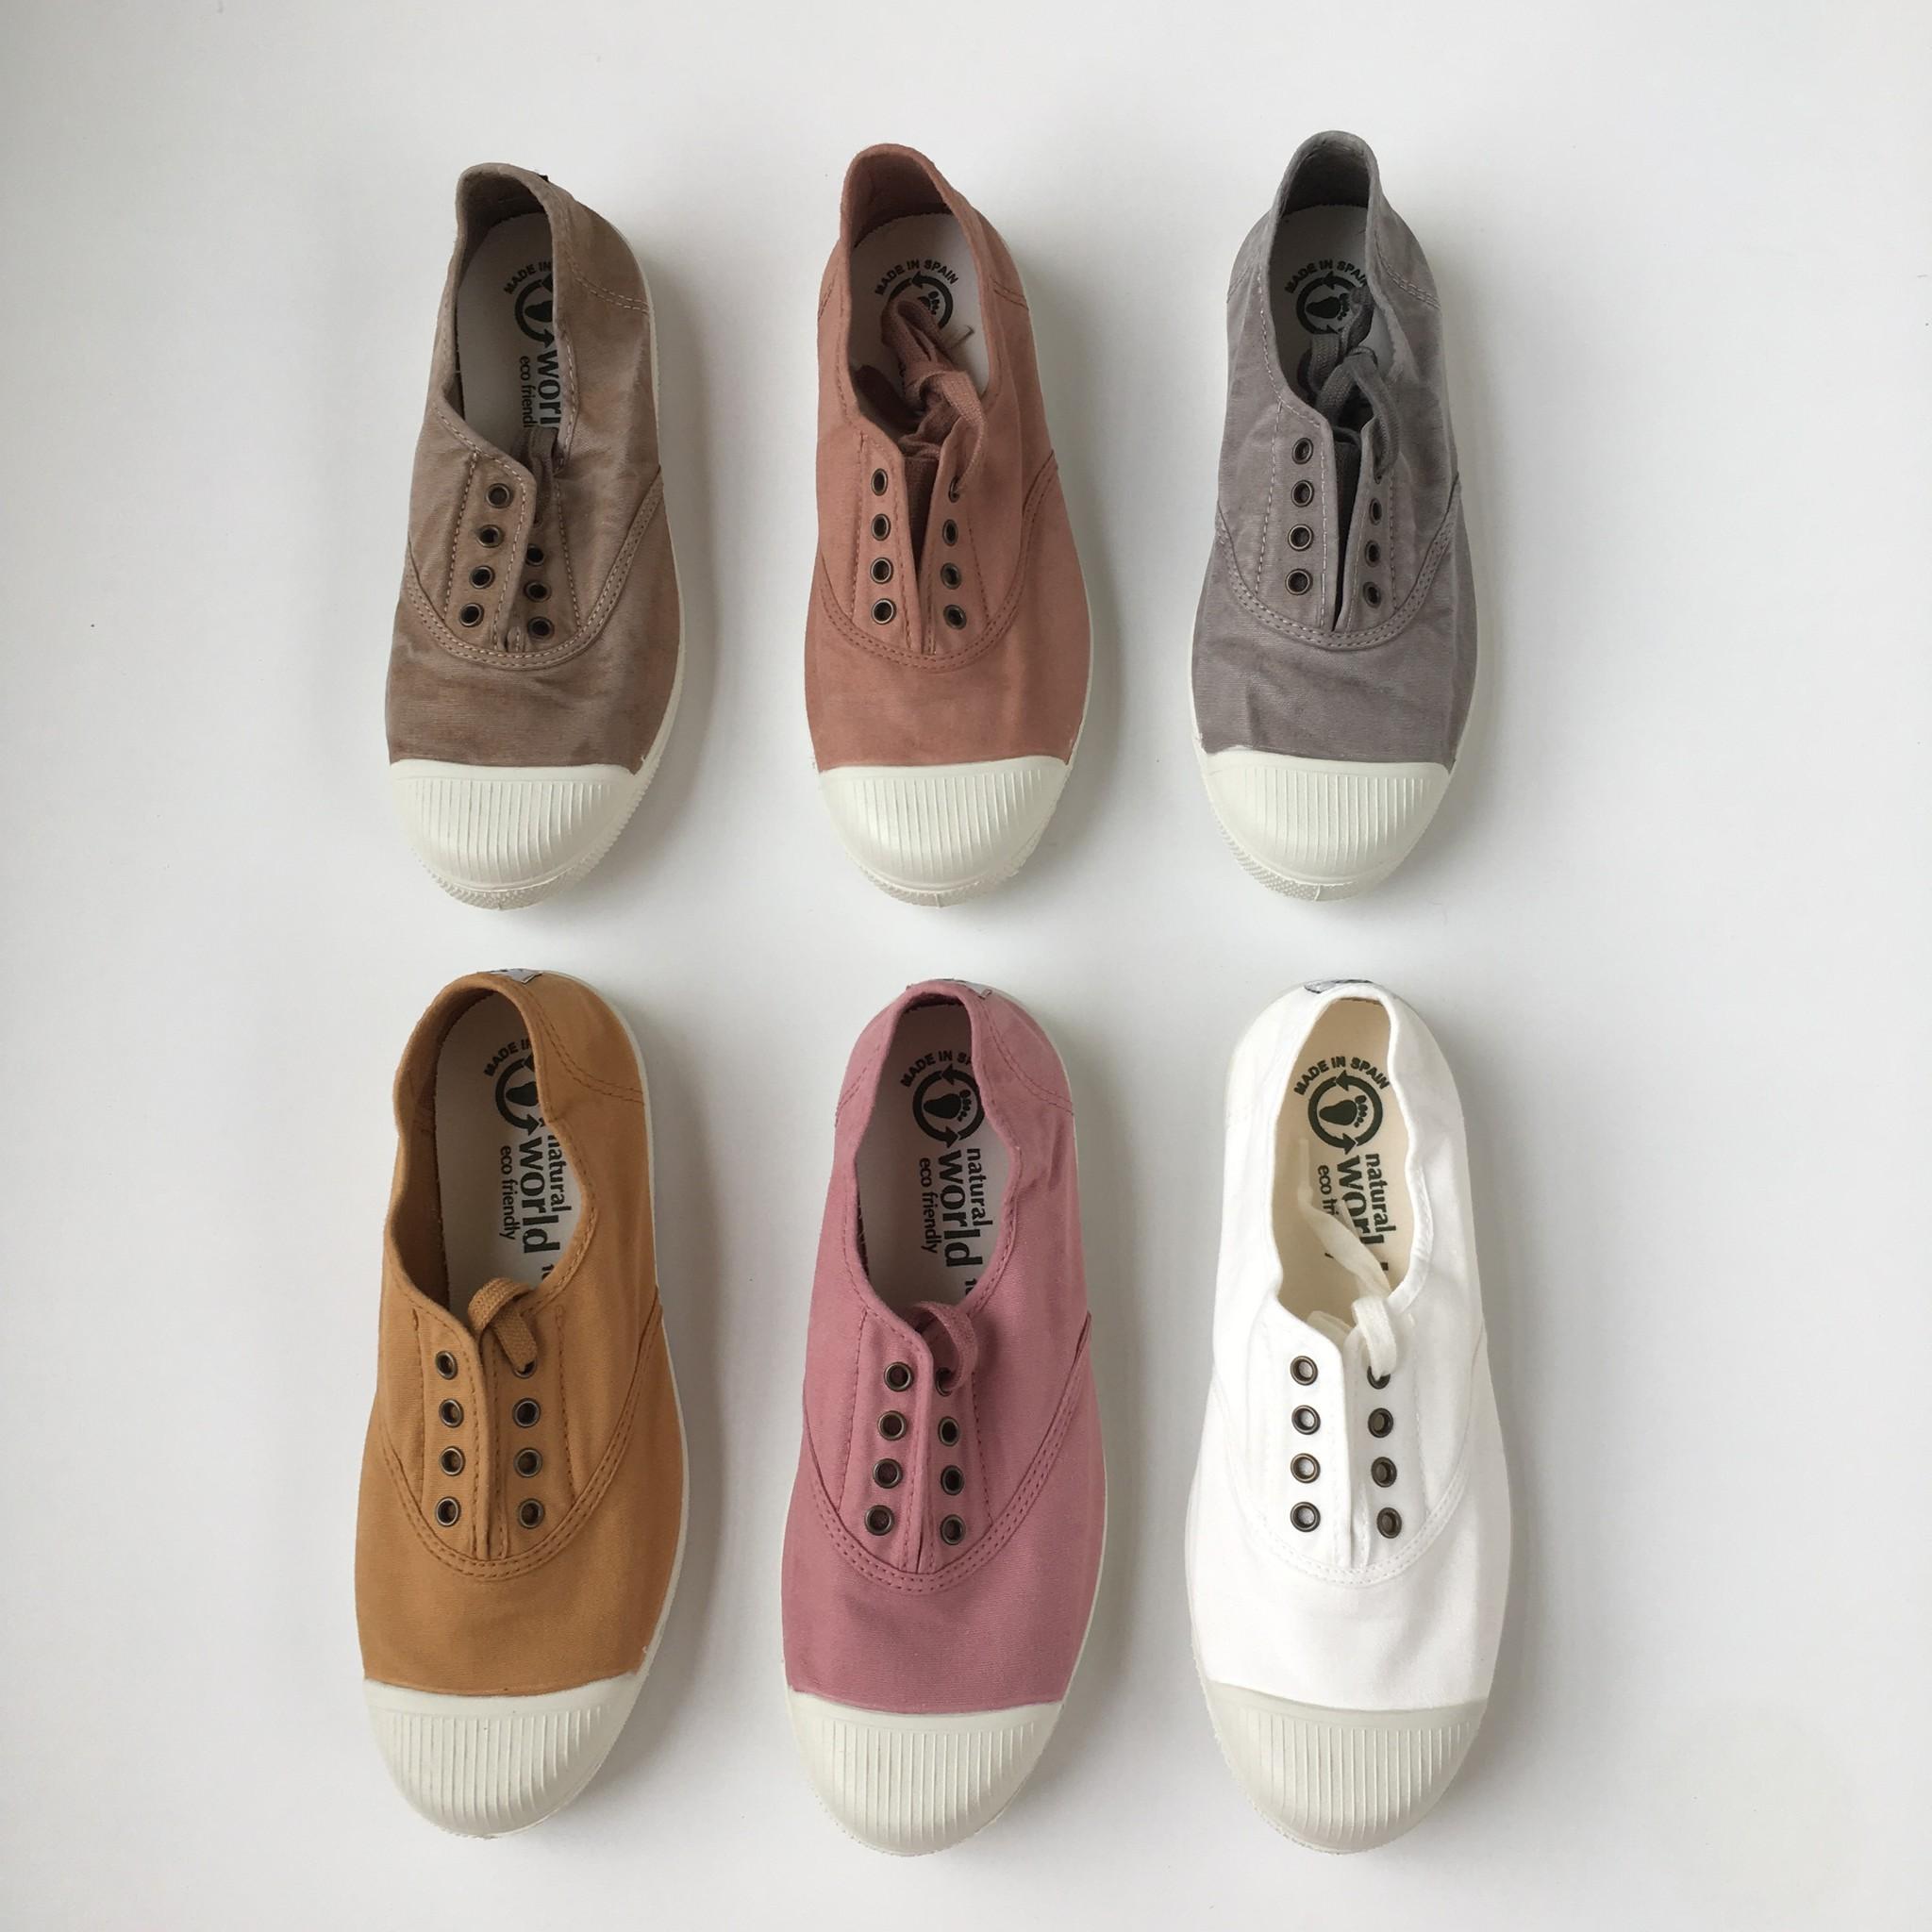 NATURAL WORLD - eco sneakers dames - 100% biologisch katoen/100% natuur rubber - stone washed licht grijs